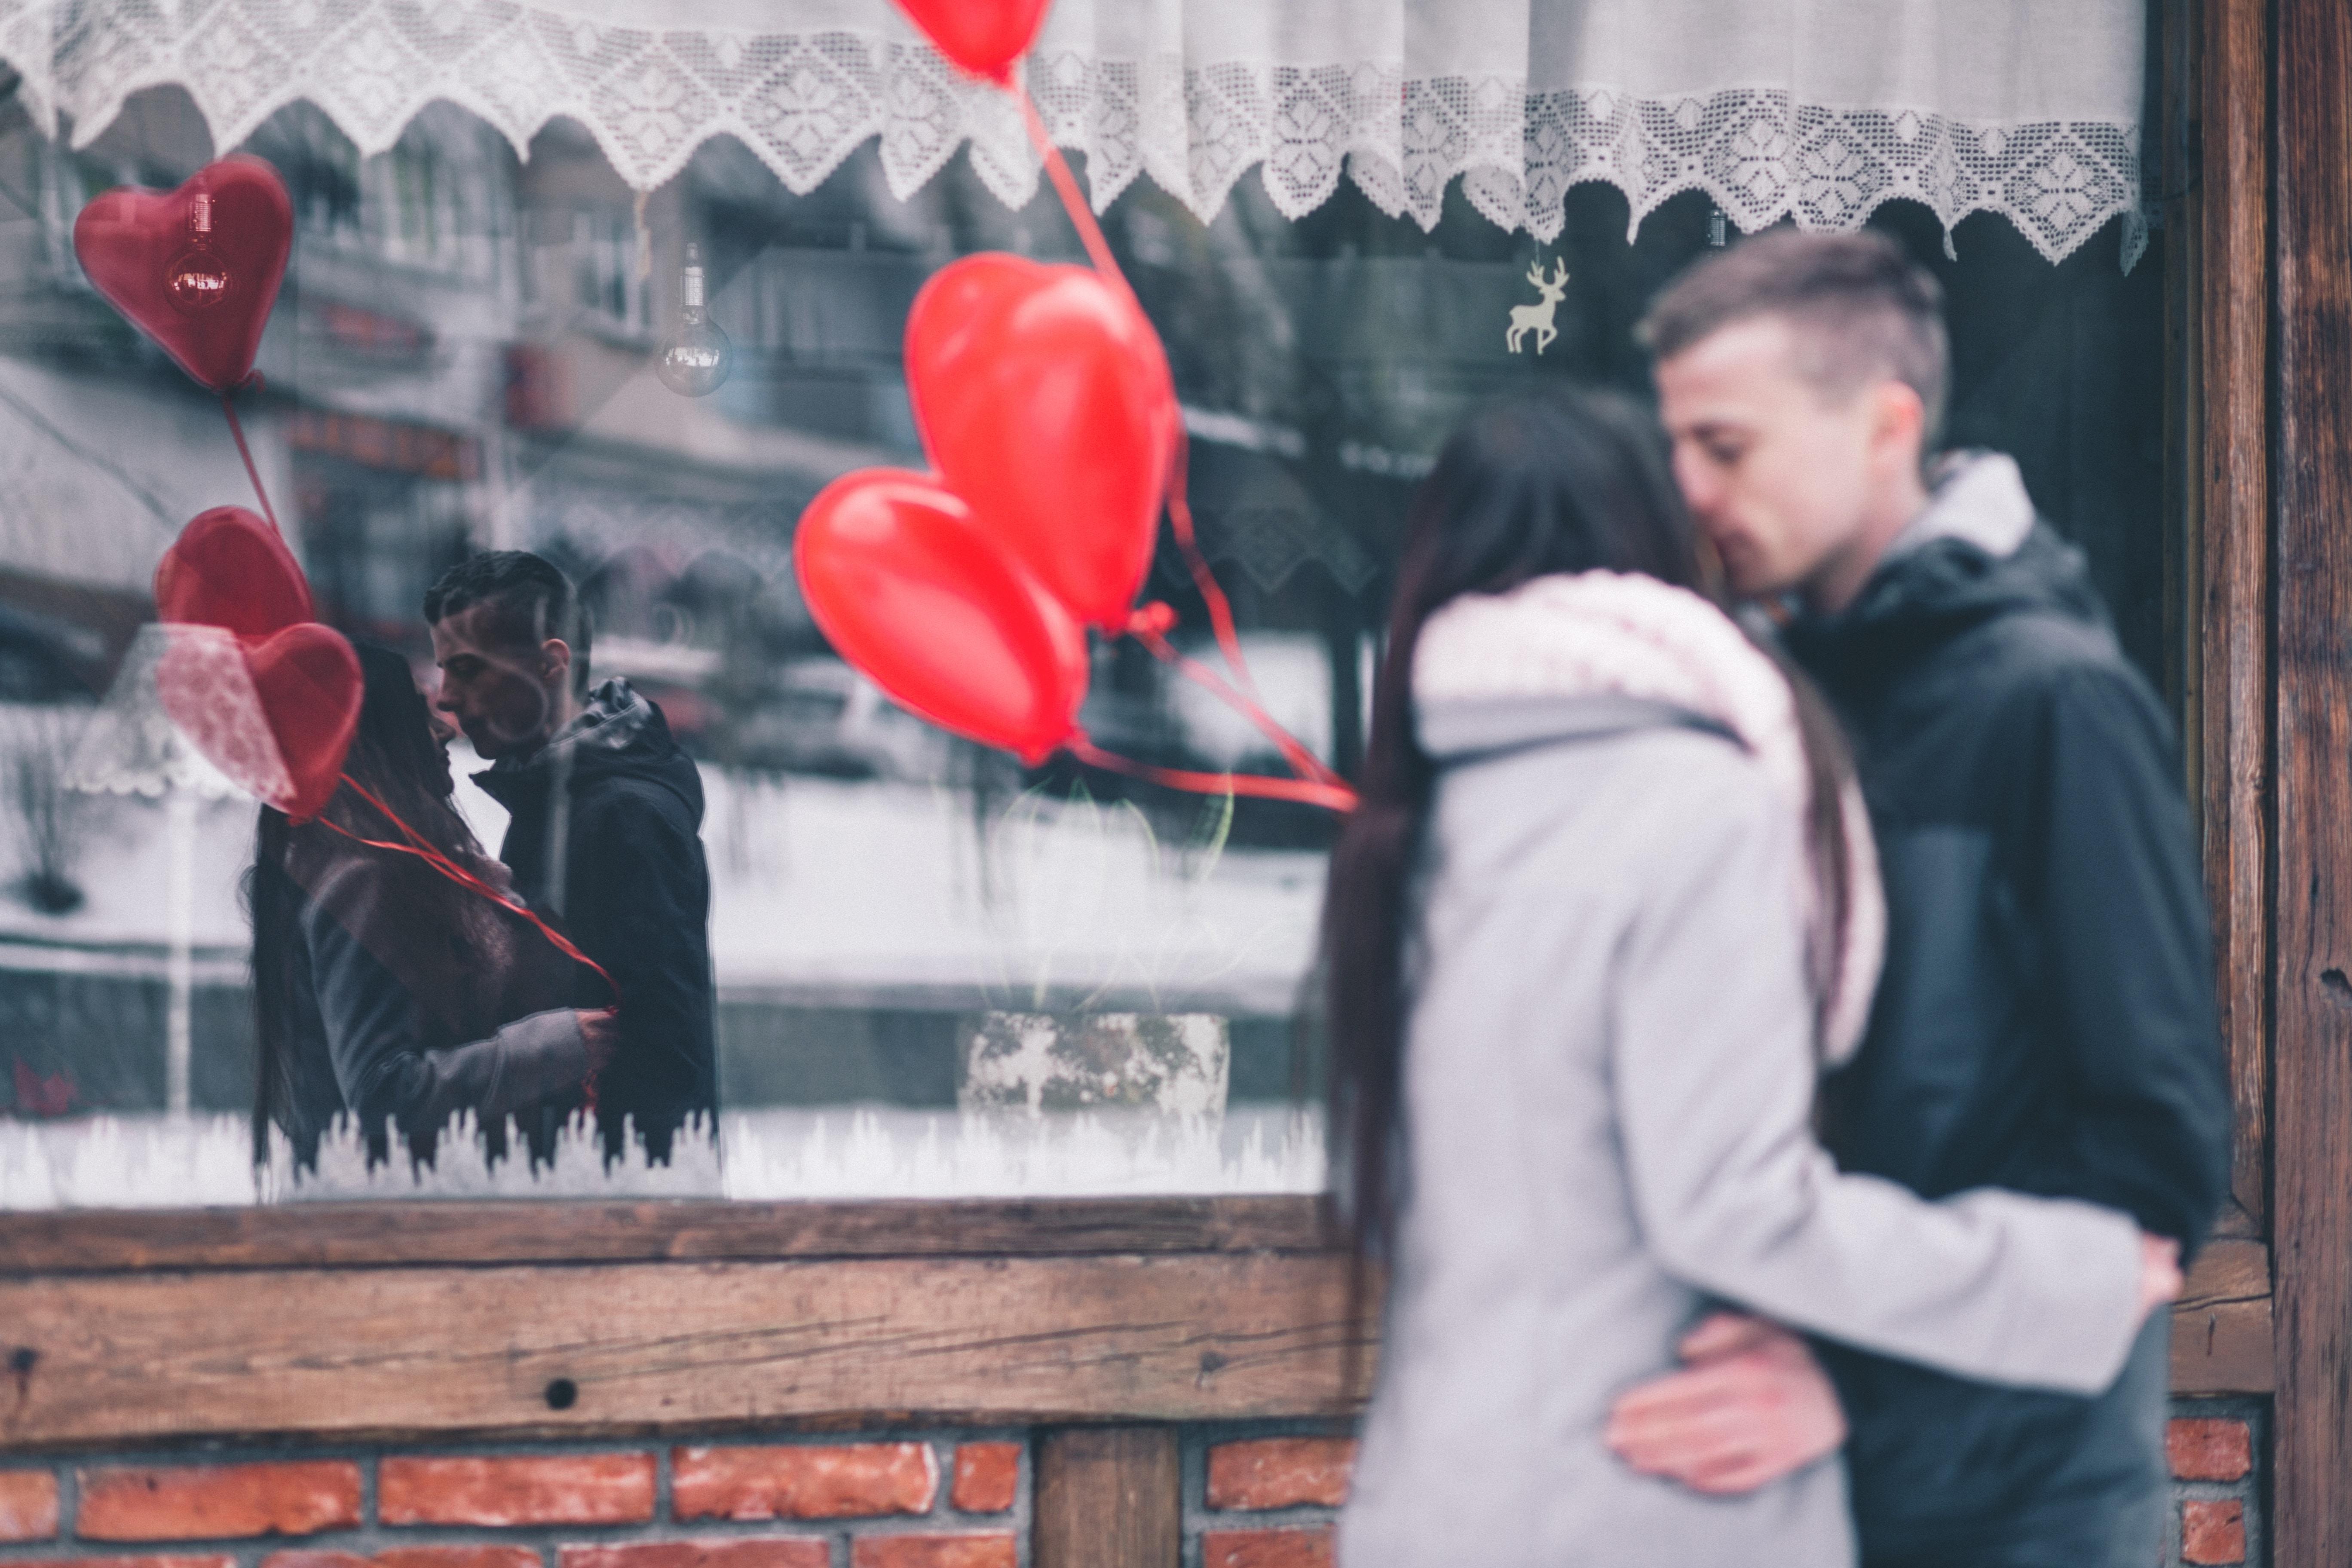 junges Paar mit roten Herzluftballons